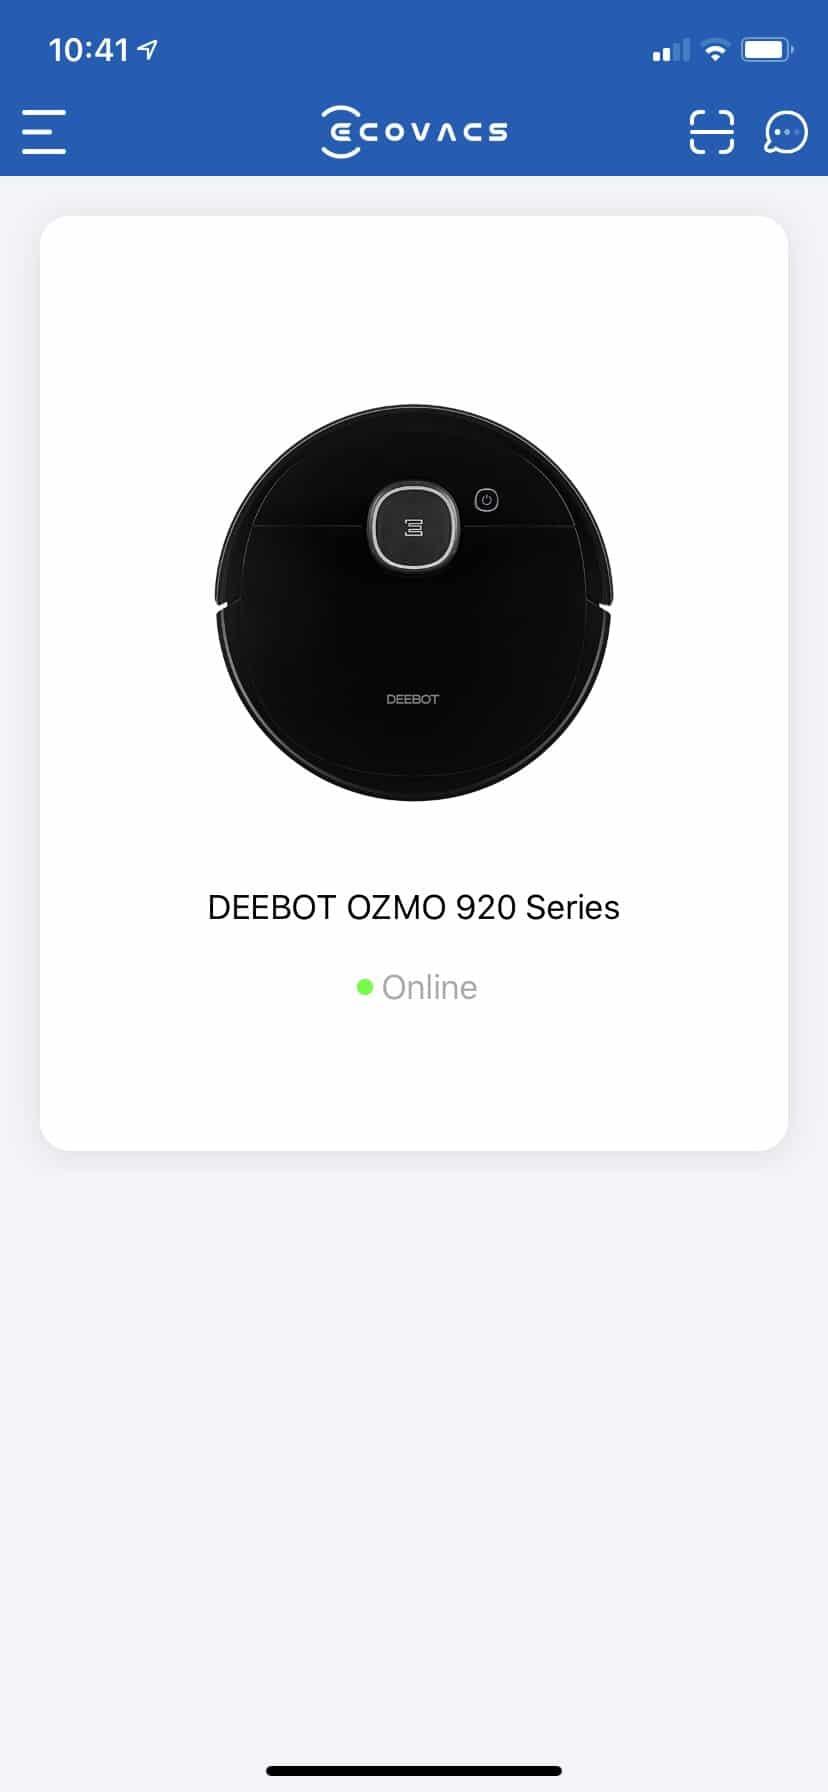 Der Ecovacs Deebot Ozmo 920 im Test 10